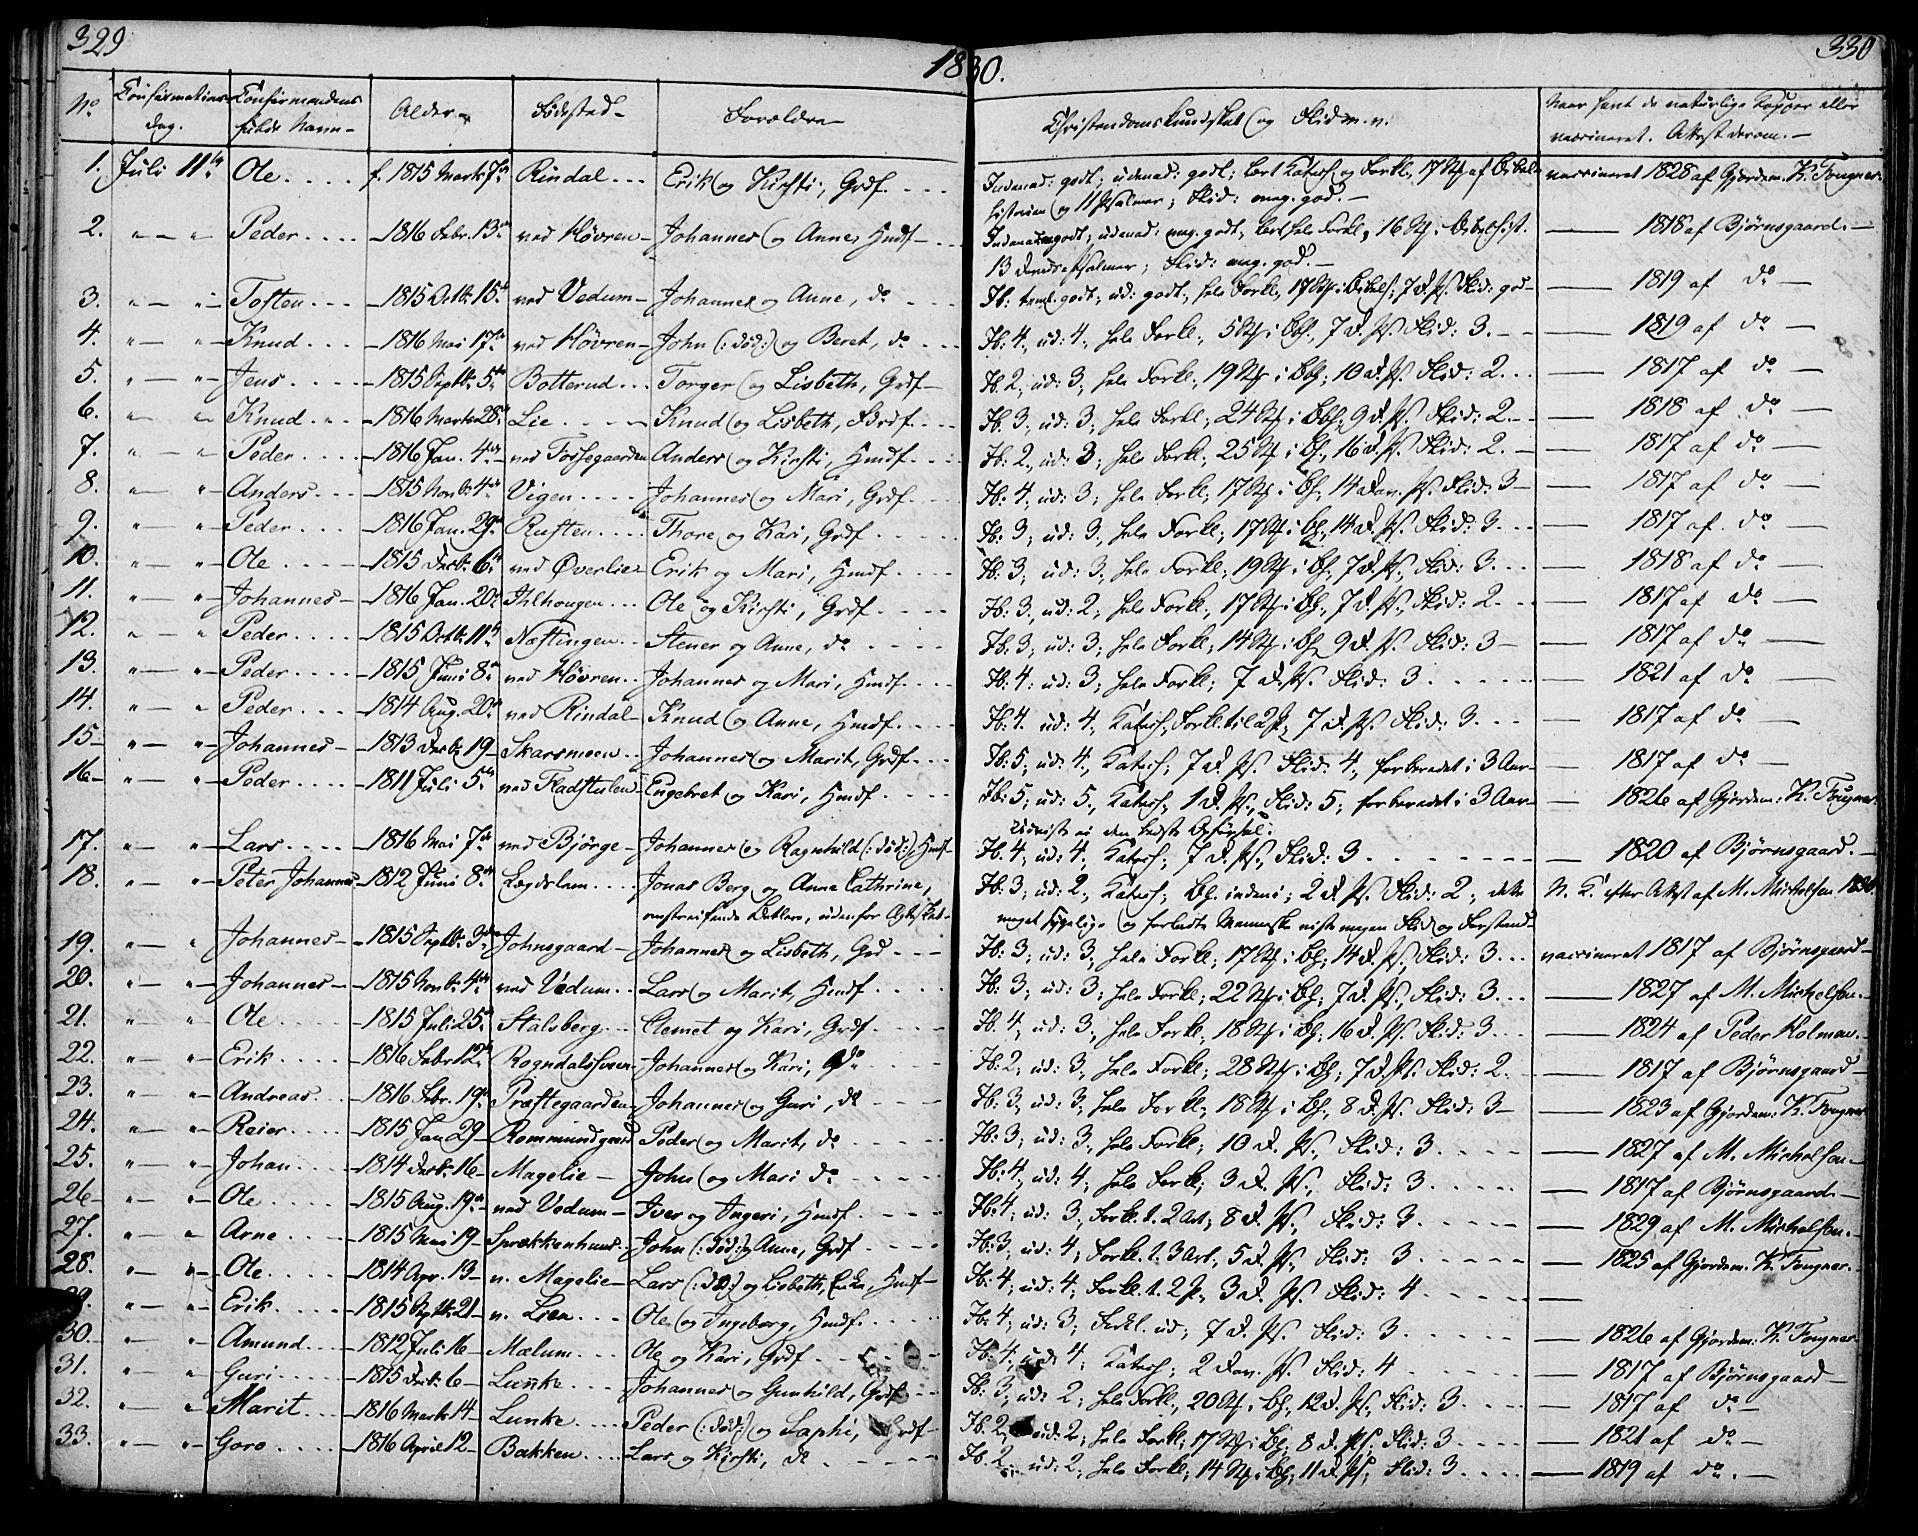 SAH, Øyer prestekontor, Ministerialbok nr. 4, 1824-1841, s. 329-330